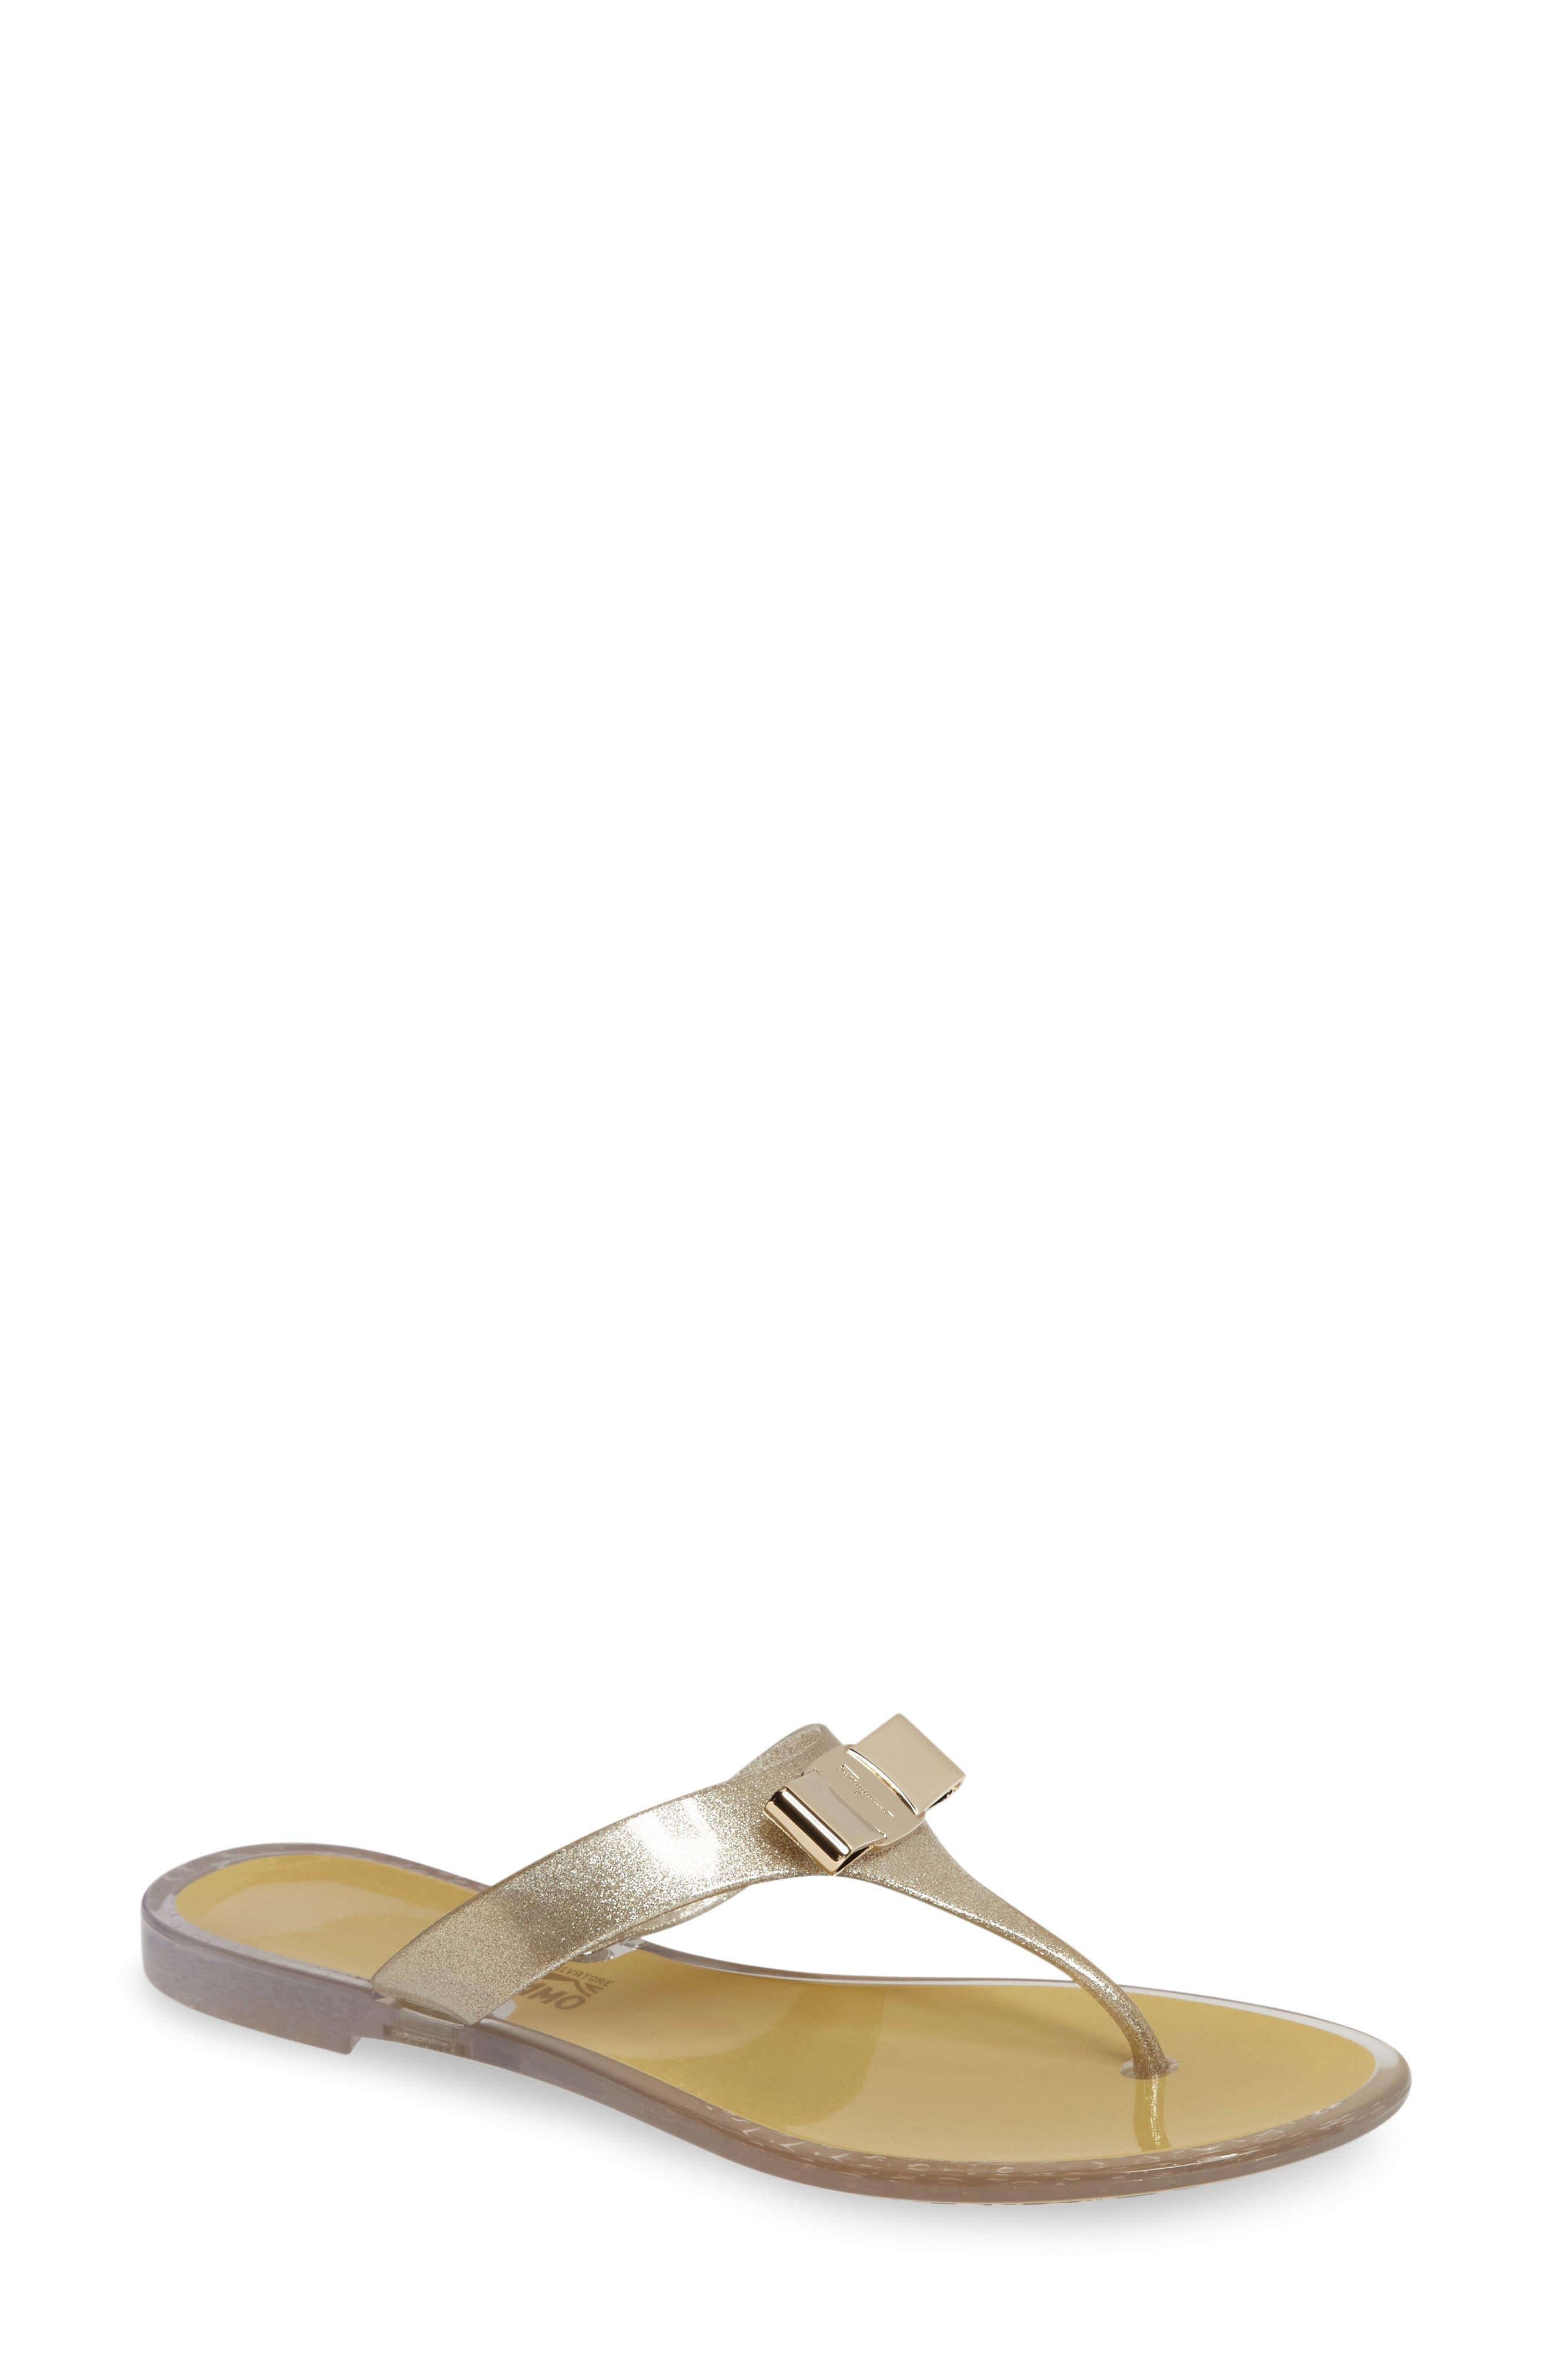 Jelly Flat Bow Sandal,                             Main thumbnail 1, color,                             Beige Glitter Pvc